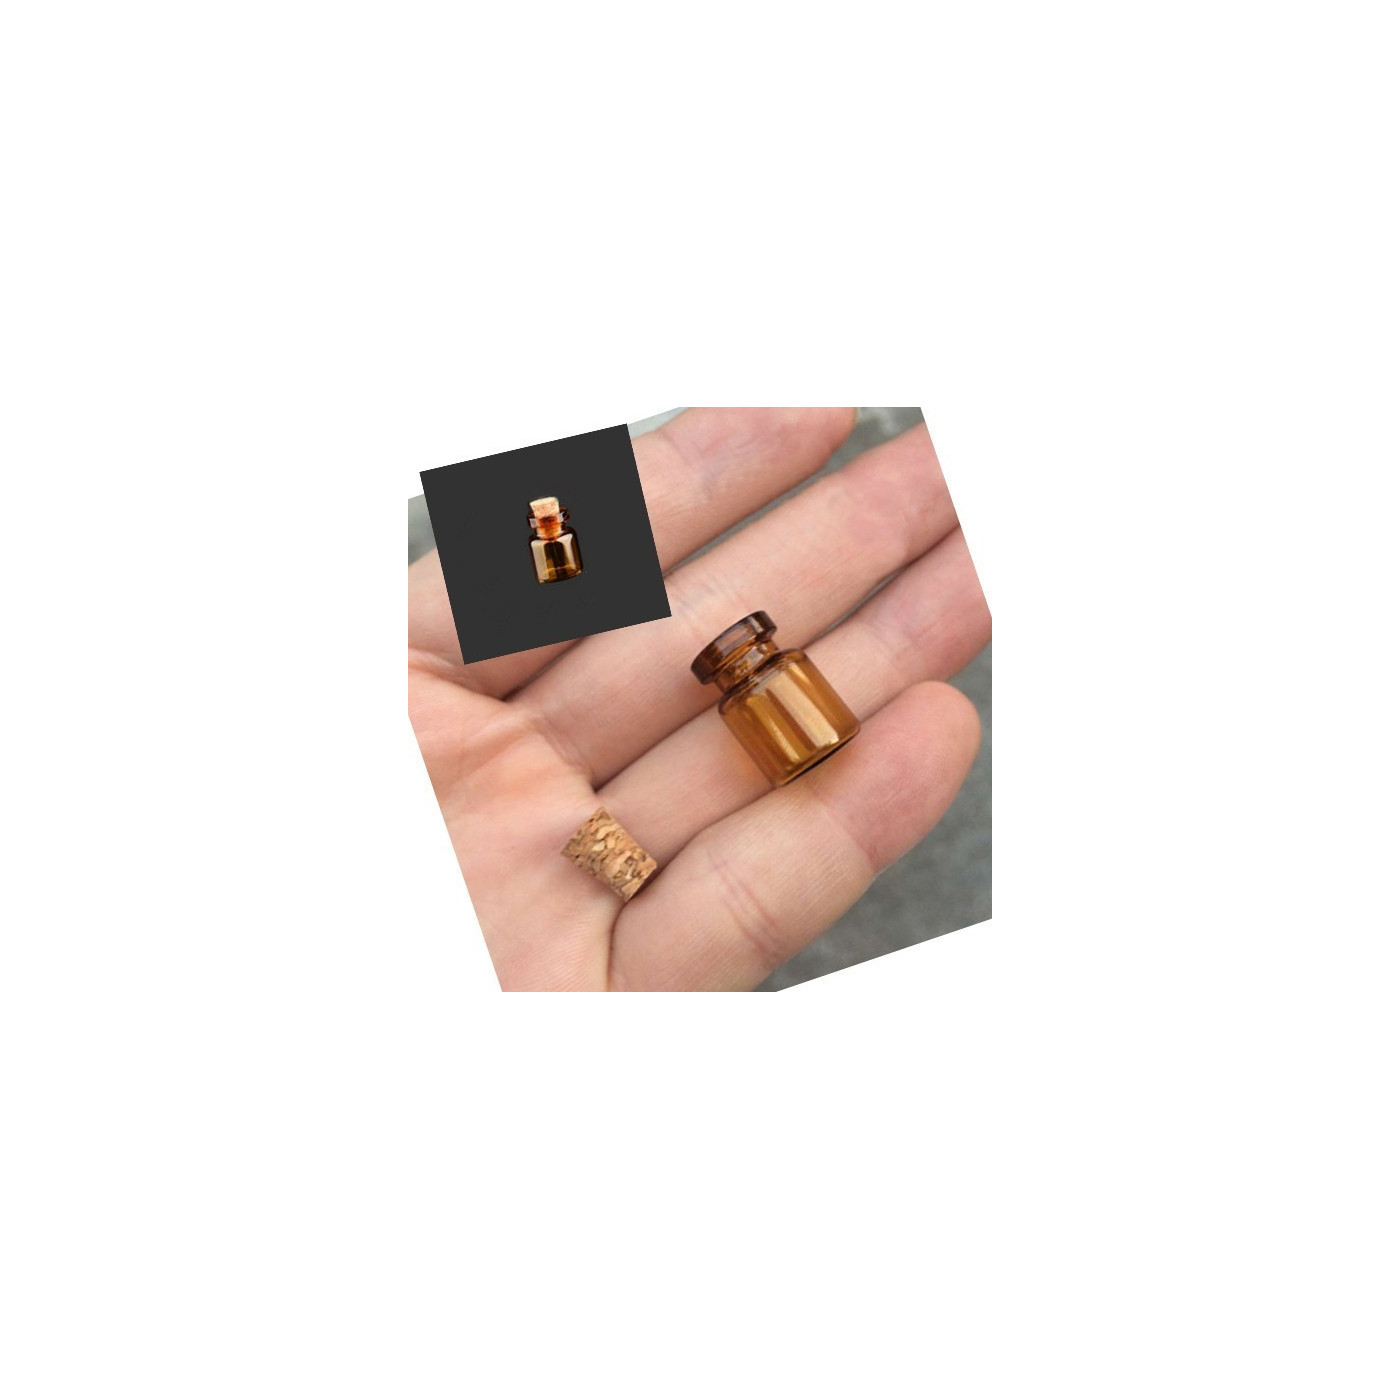 Conjunto de mini frascos de vidro, 13x18x6 mm (50 unid.)  - 1